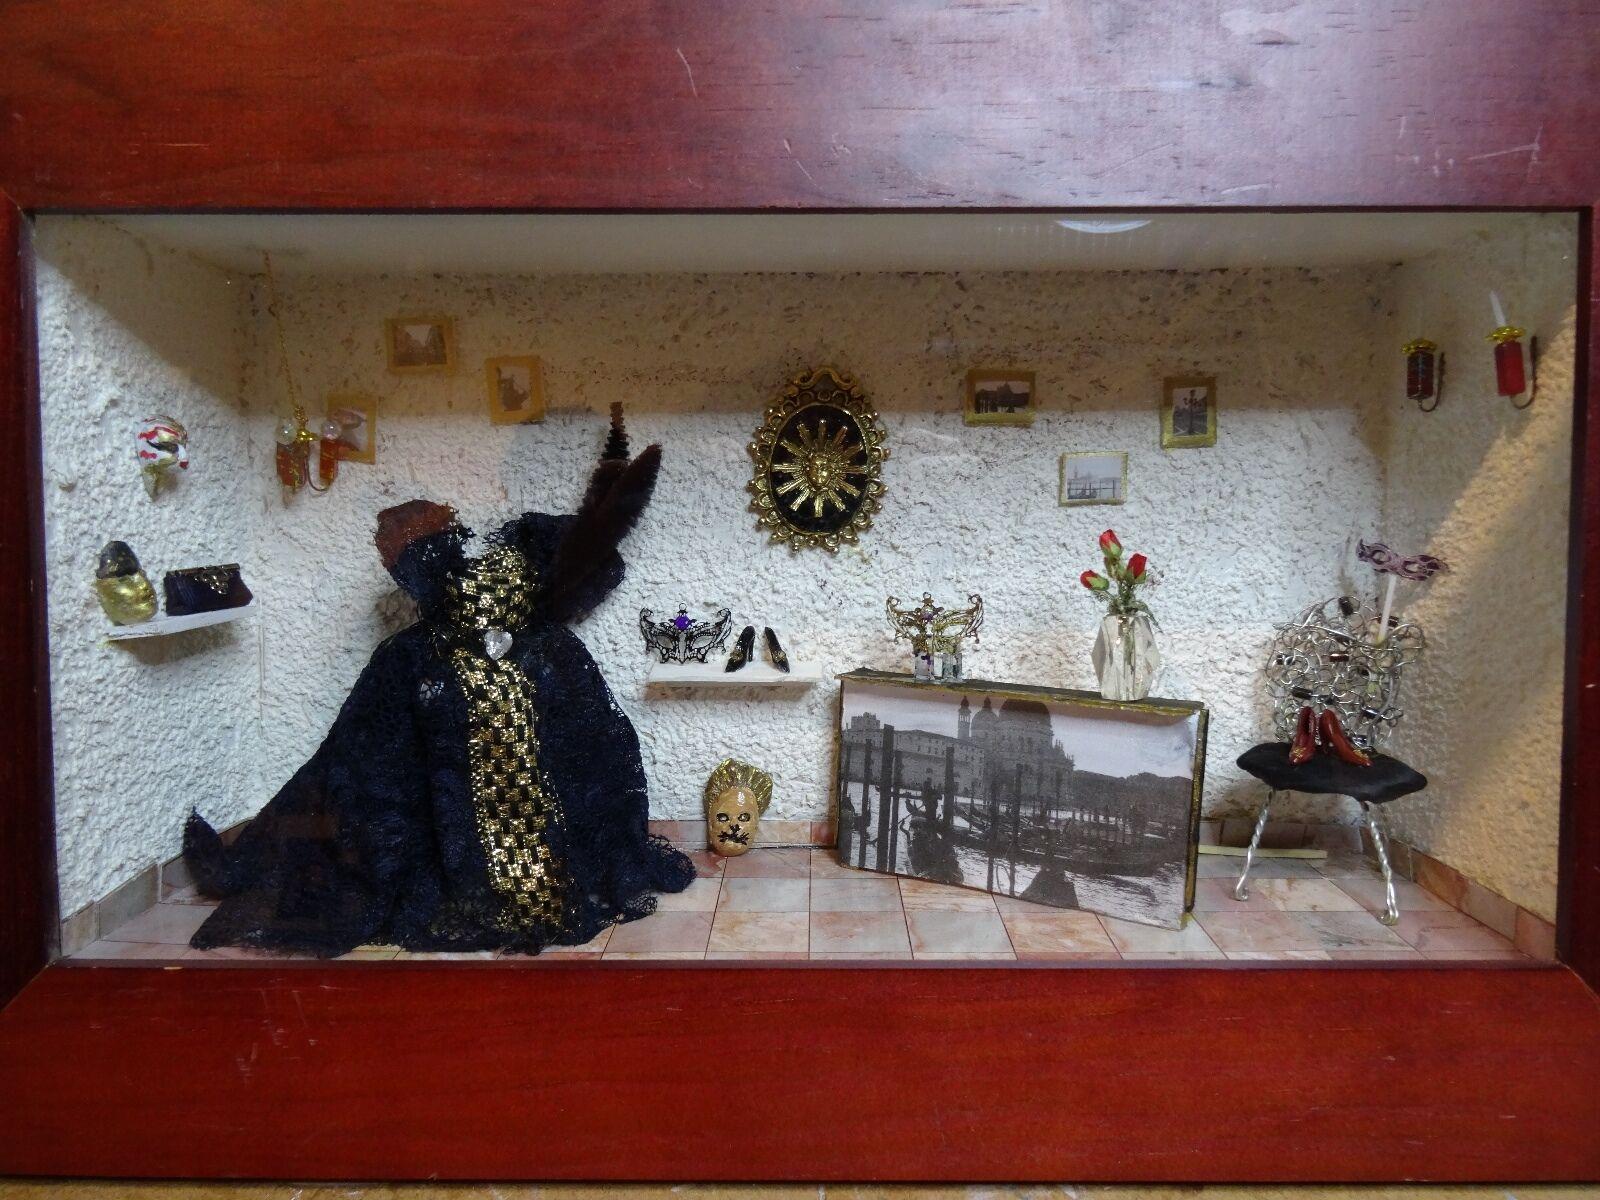 ventas en linea Vitrine miniature miniature miniature 40x35 cms Venise Karago  la red entera más baja